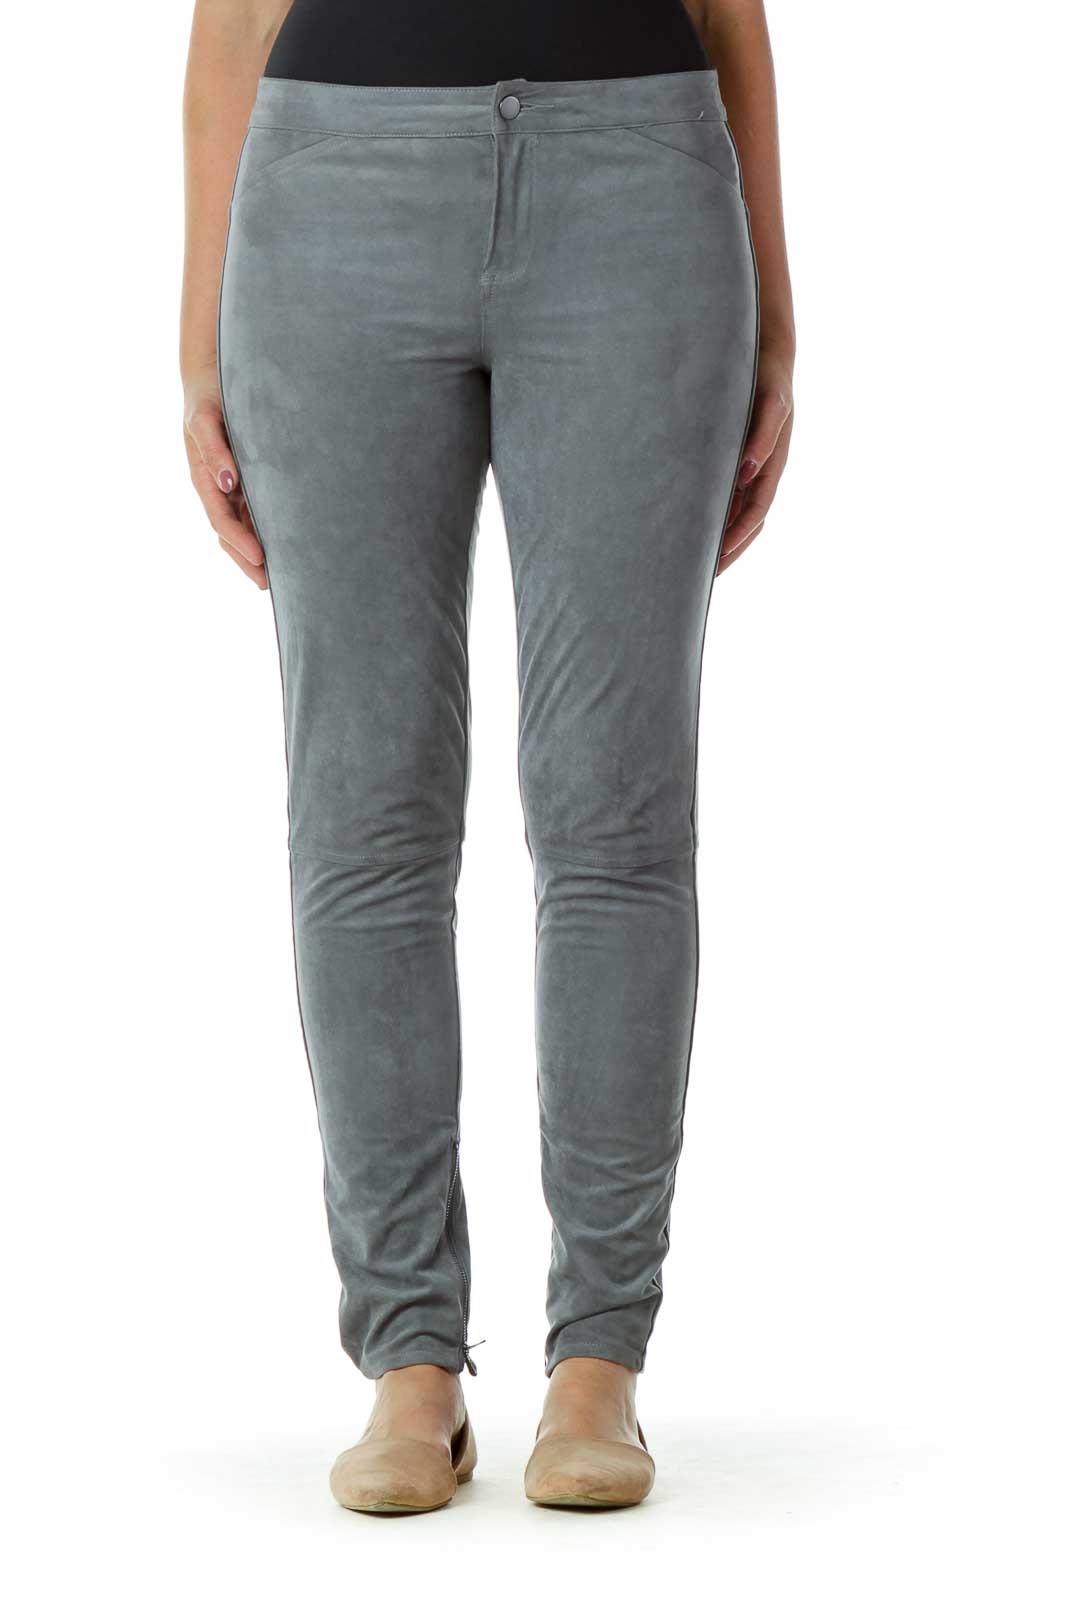 Gray Suede Skinny Zipper Leg Pants Front